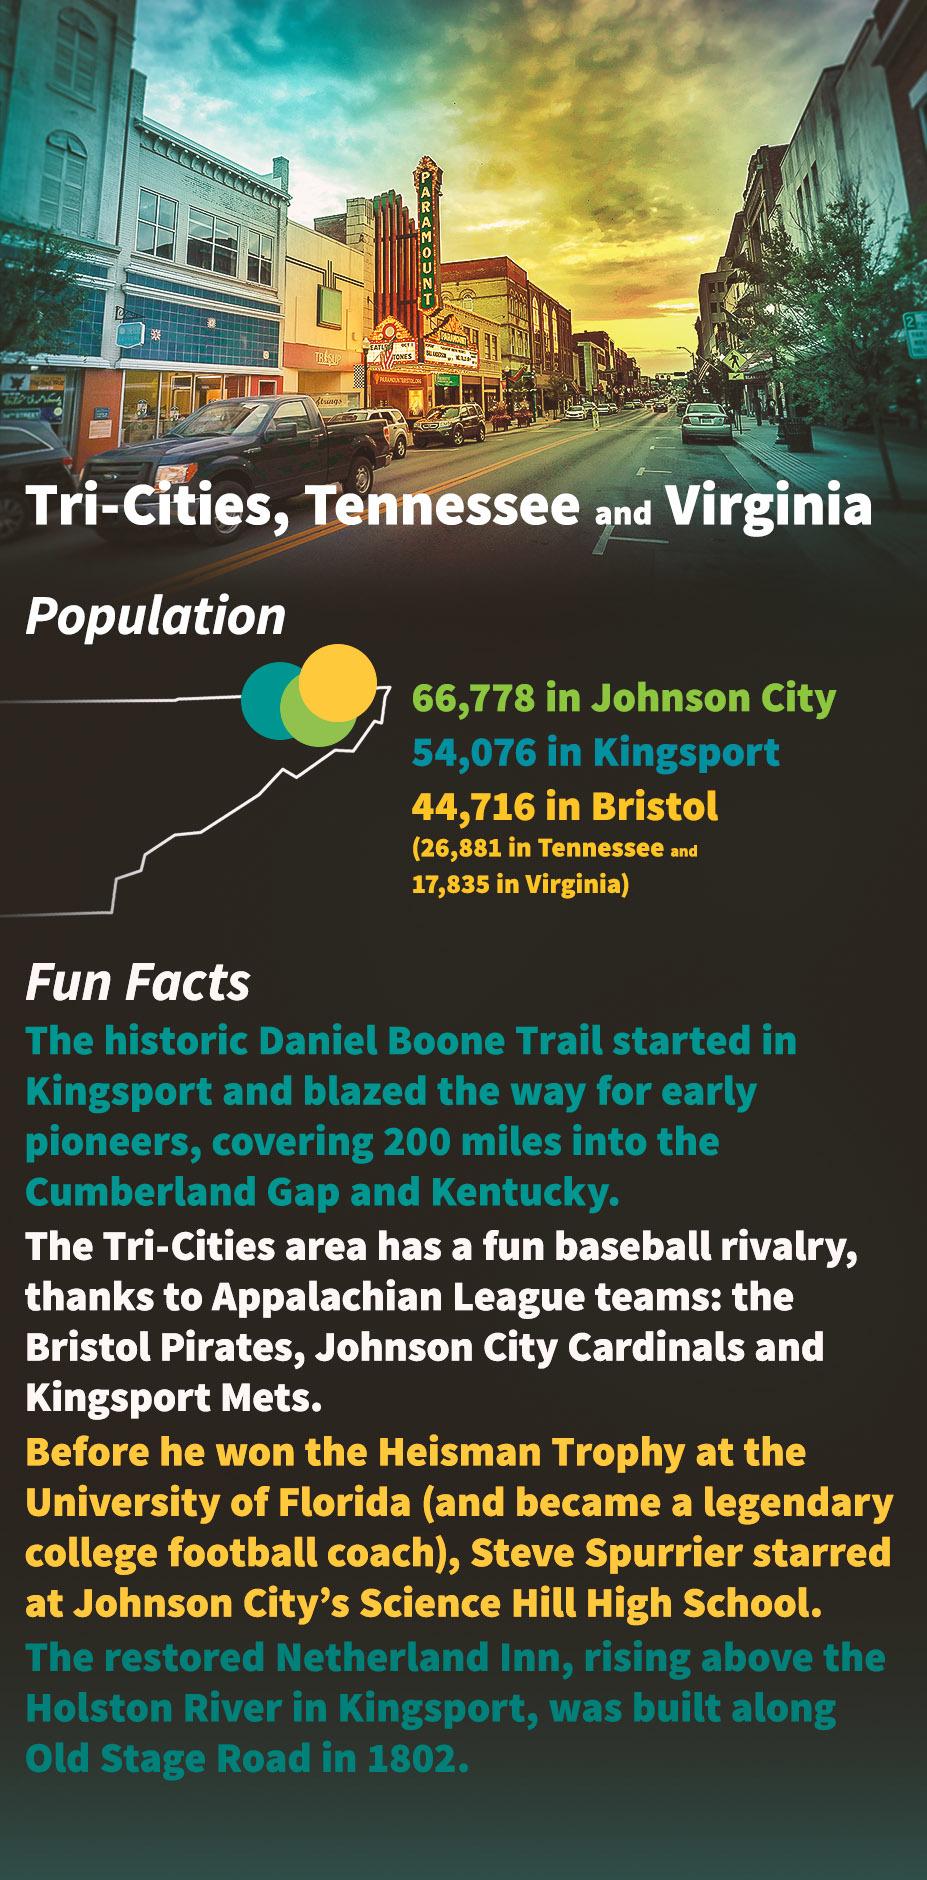 Tri-Cities Fun Facts